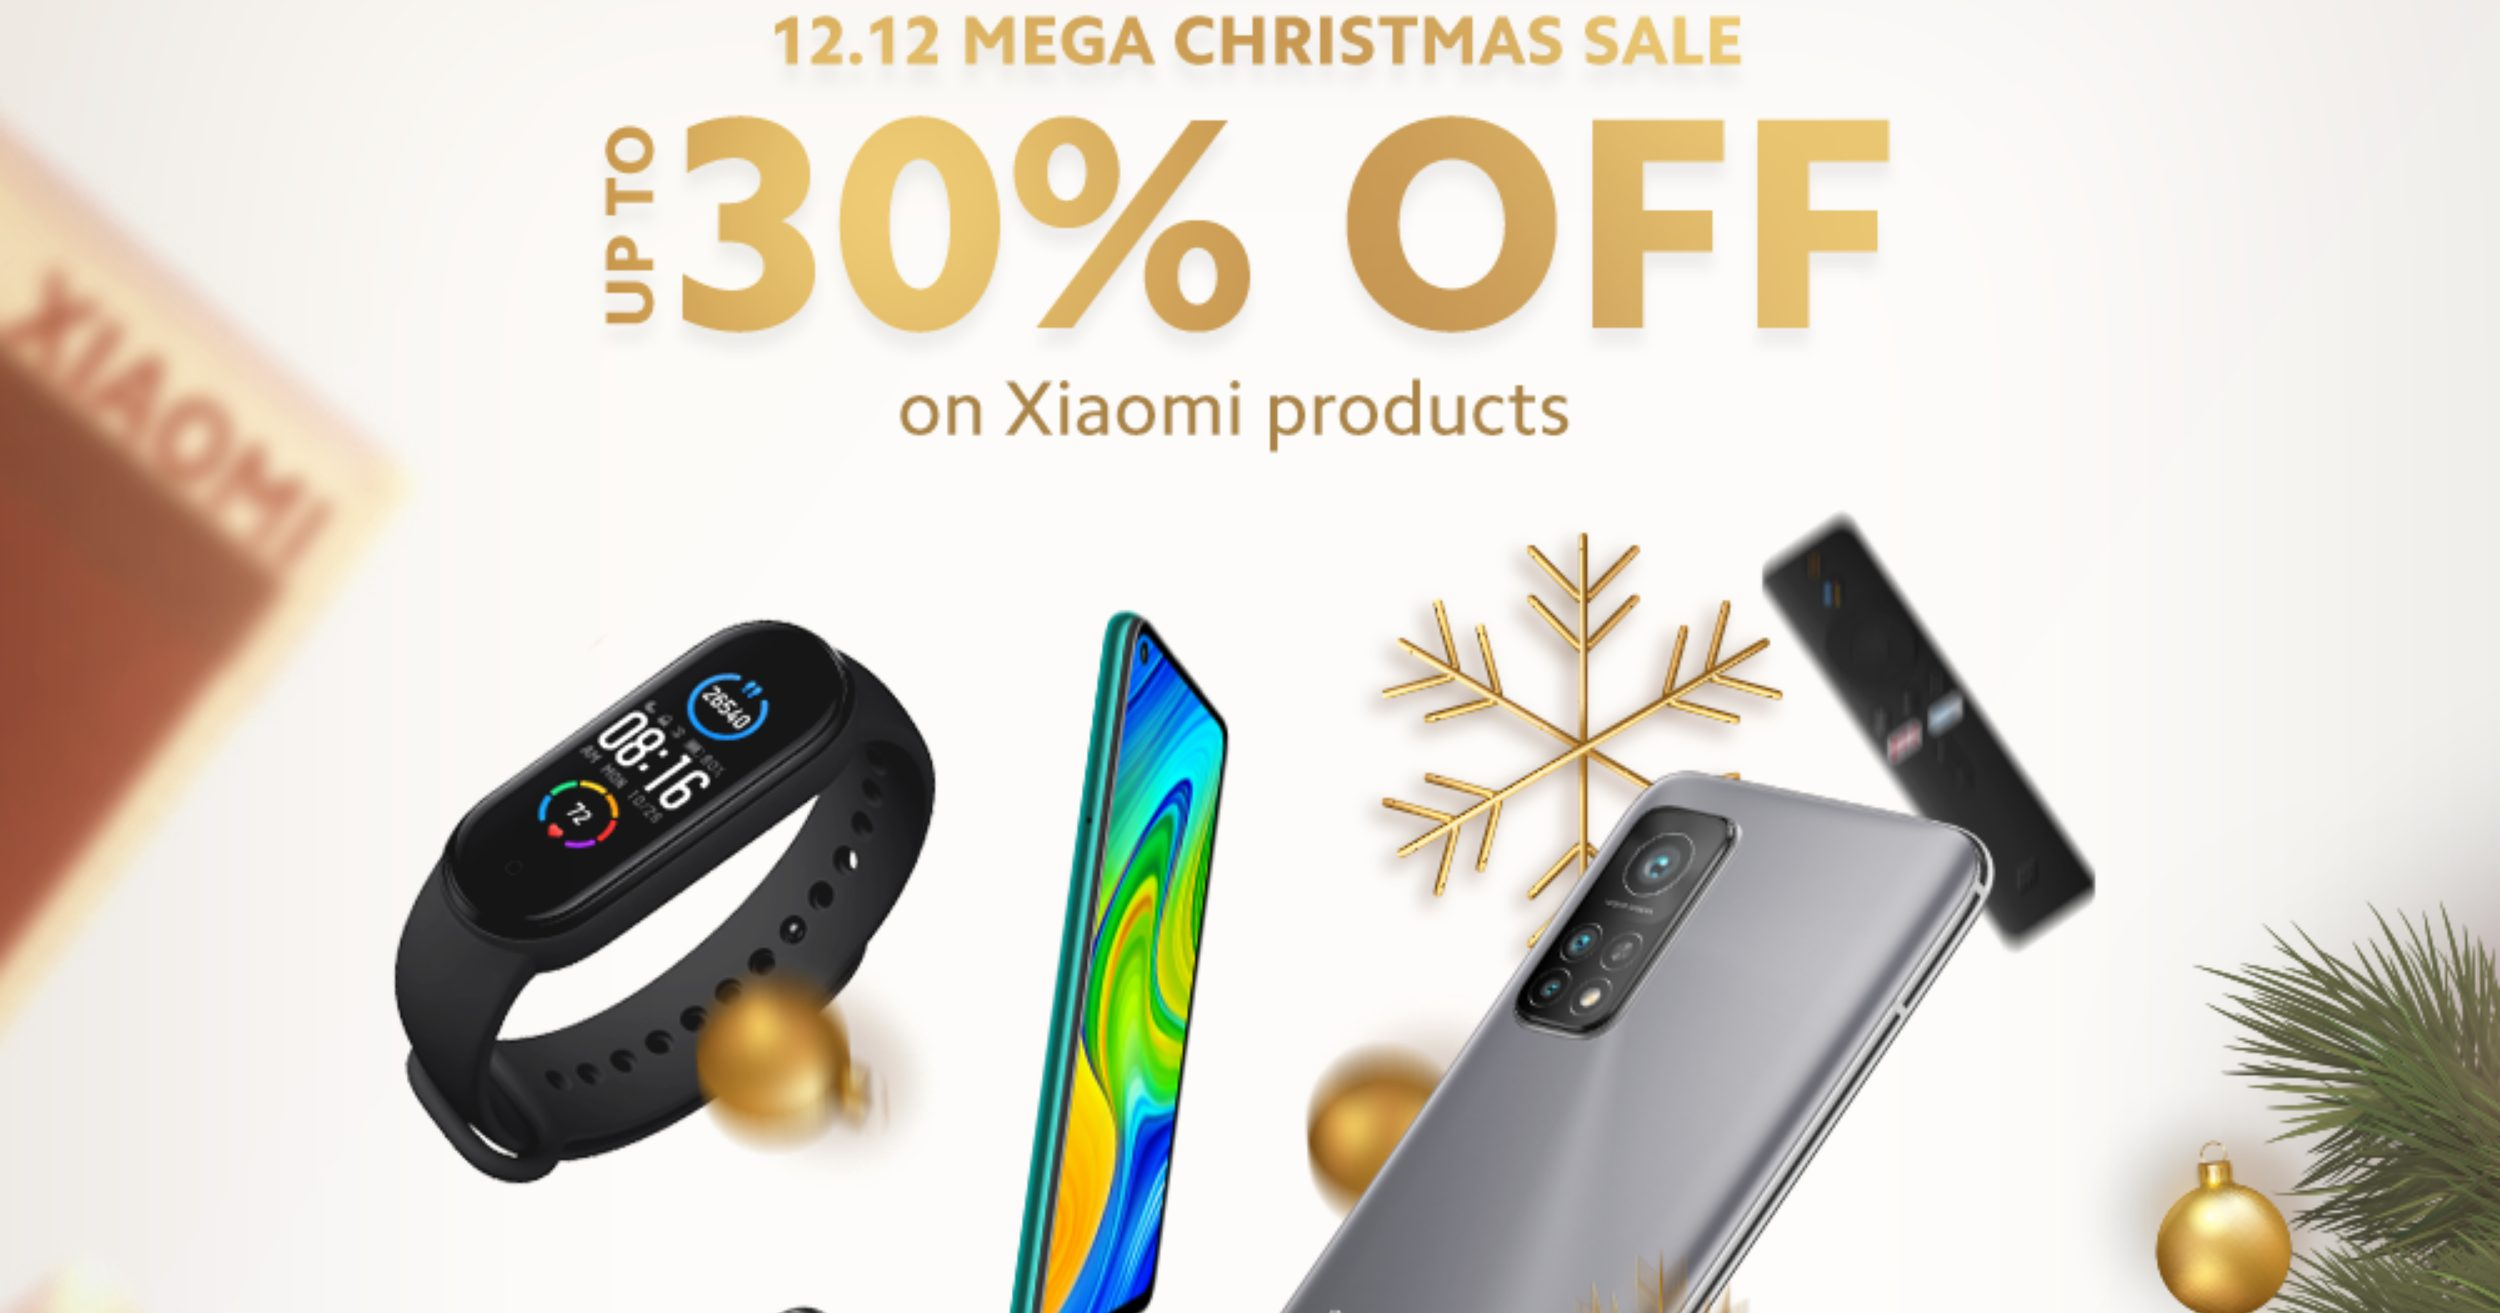 xiaomi-12-12-christmas-sale-price-list-poco-x3-for-p9990